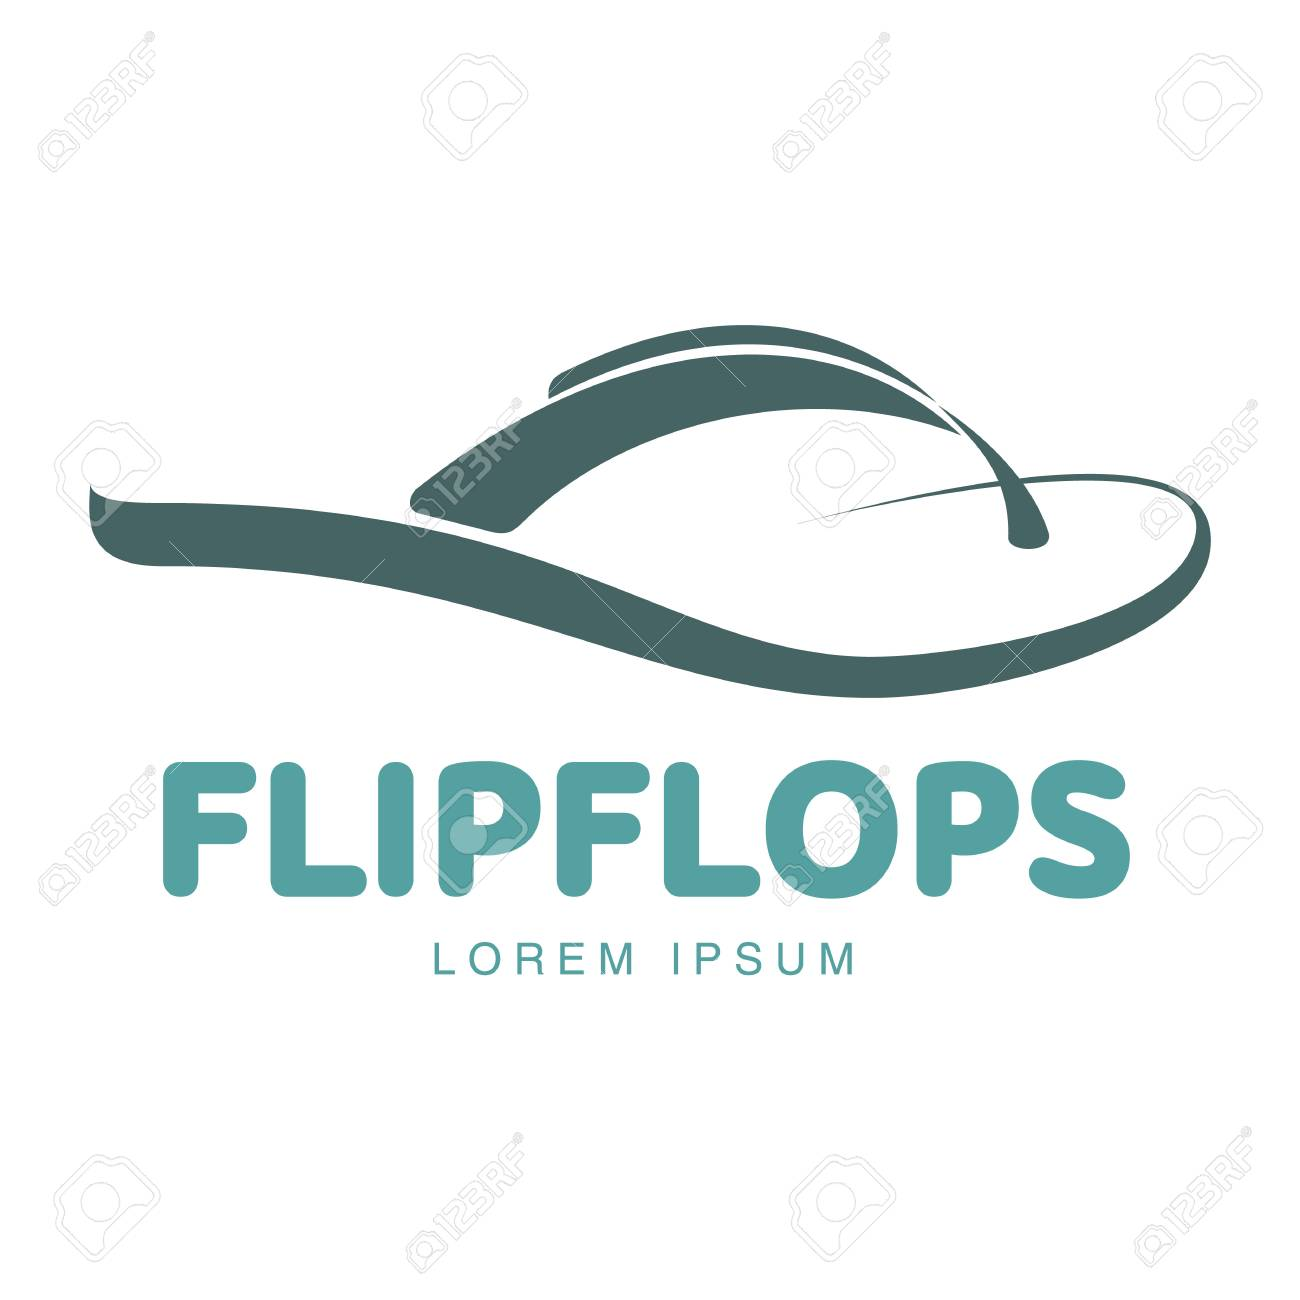 760bb8ce63fec Stylized Twisted Rubber Flip Flop Logo Template